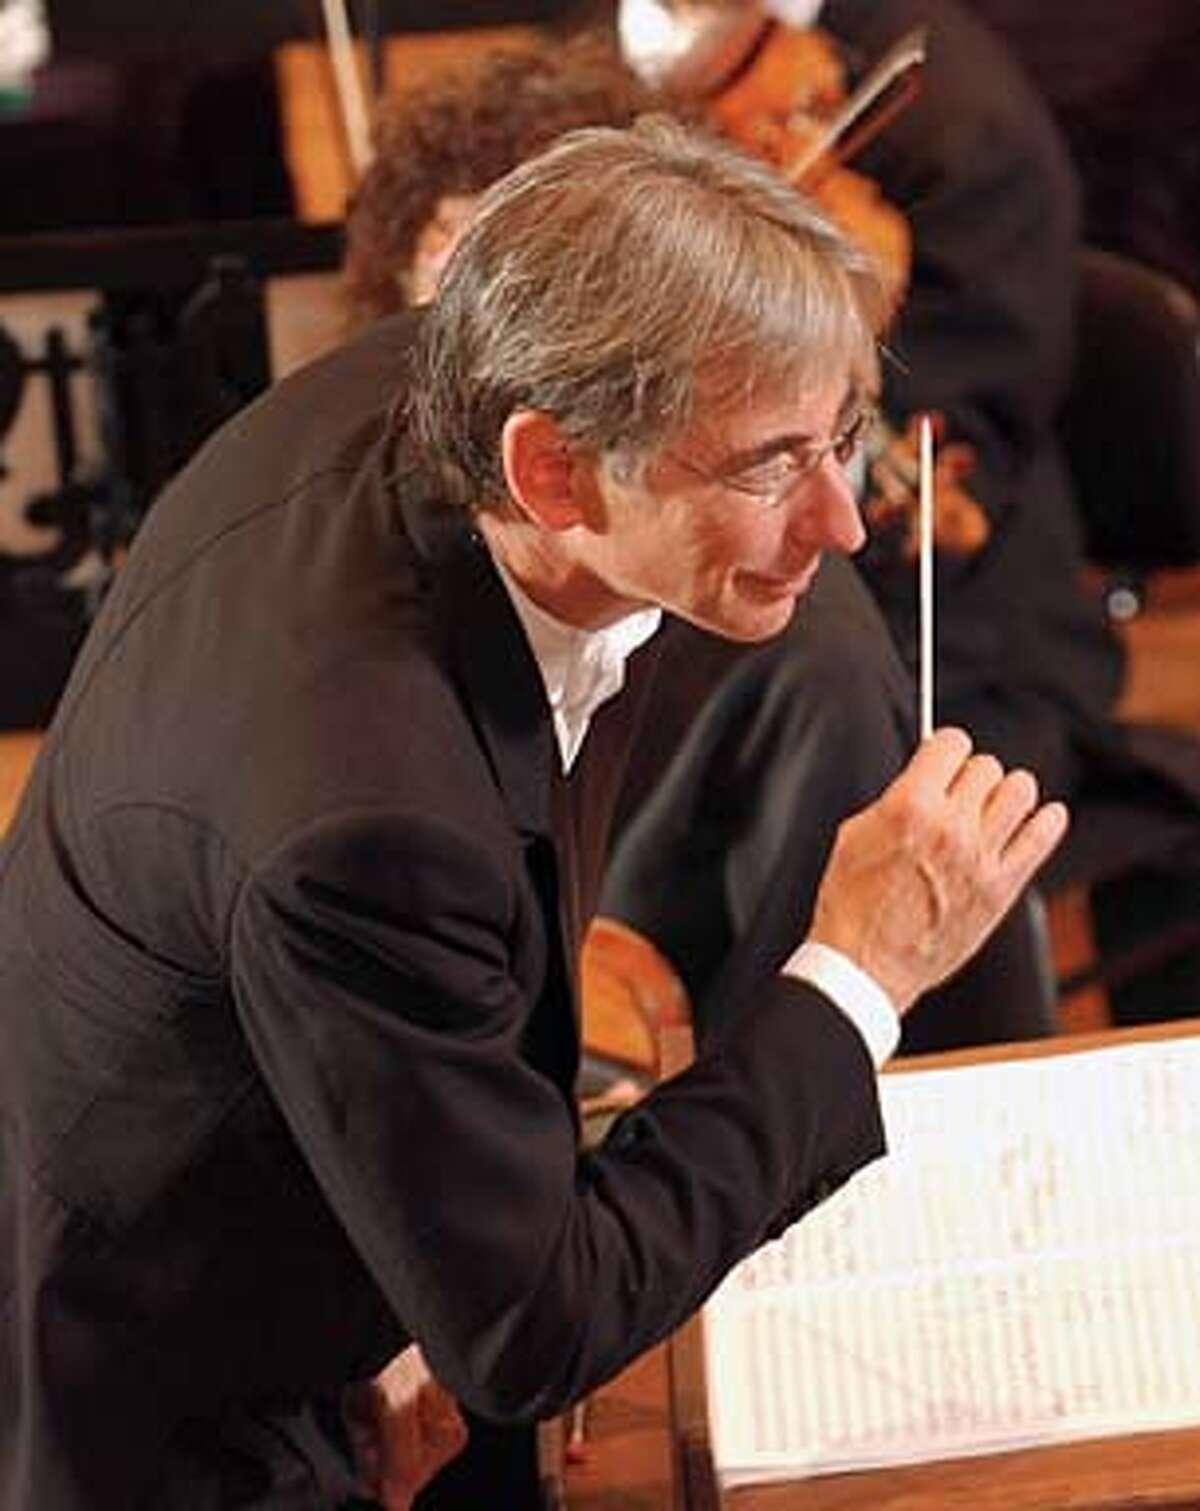 SYMPH05 Conductor Michael Tilson Thomas, San Francisco Symphony. Datebook#Datebook#Chronicle#10/1/2004#ALL#Advance##0421653949